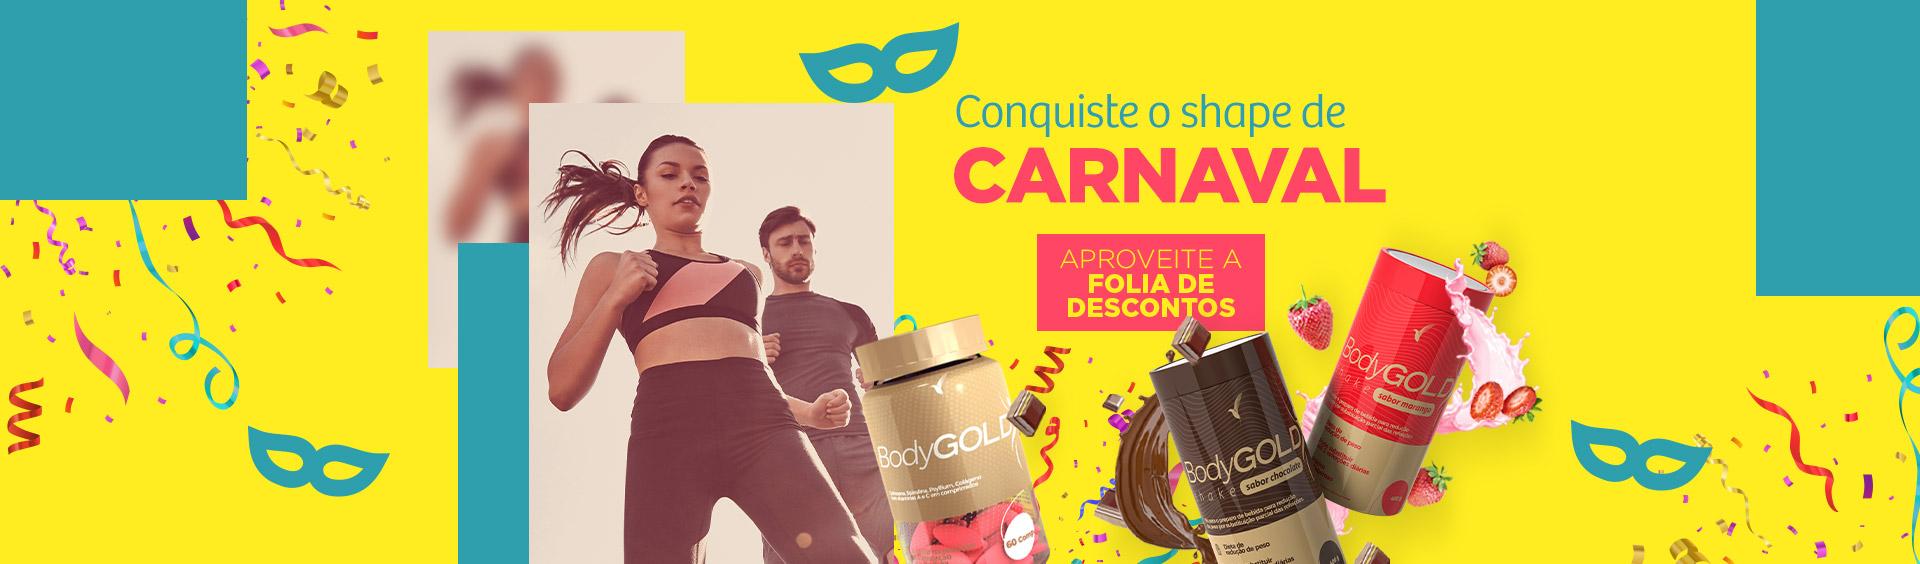 Carnaval - BG BS